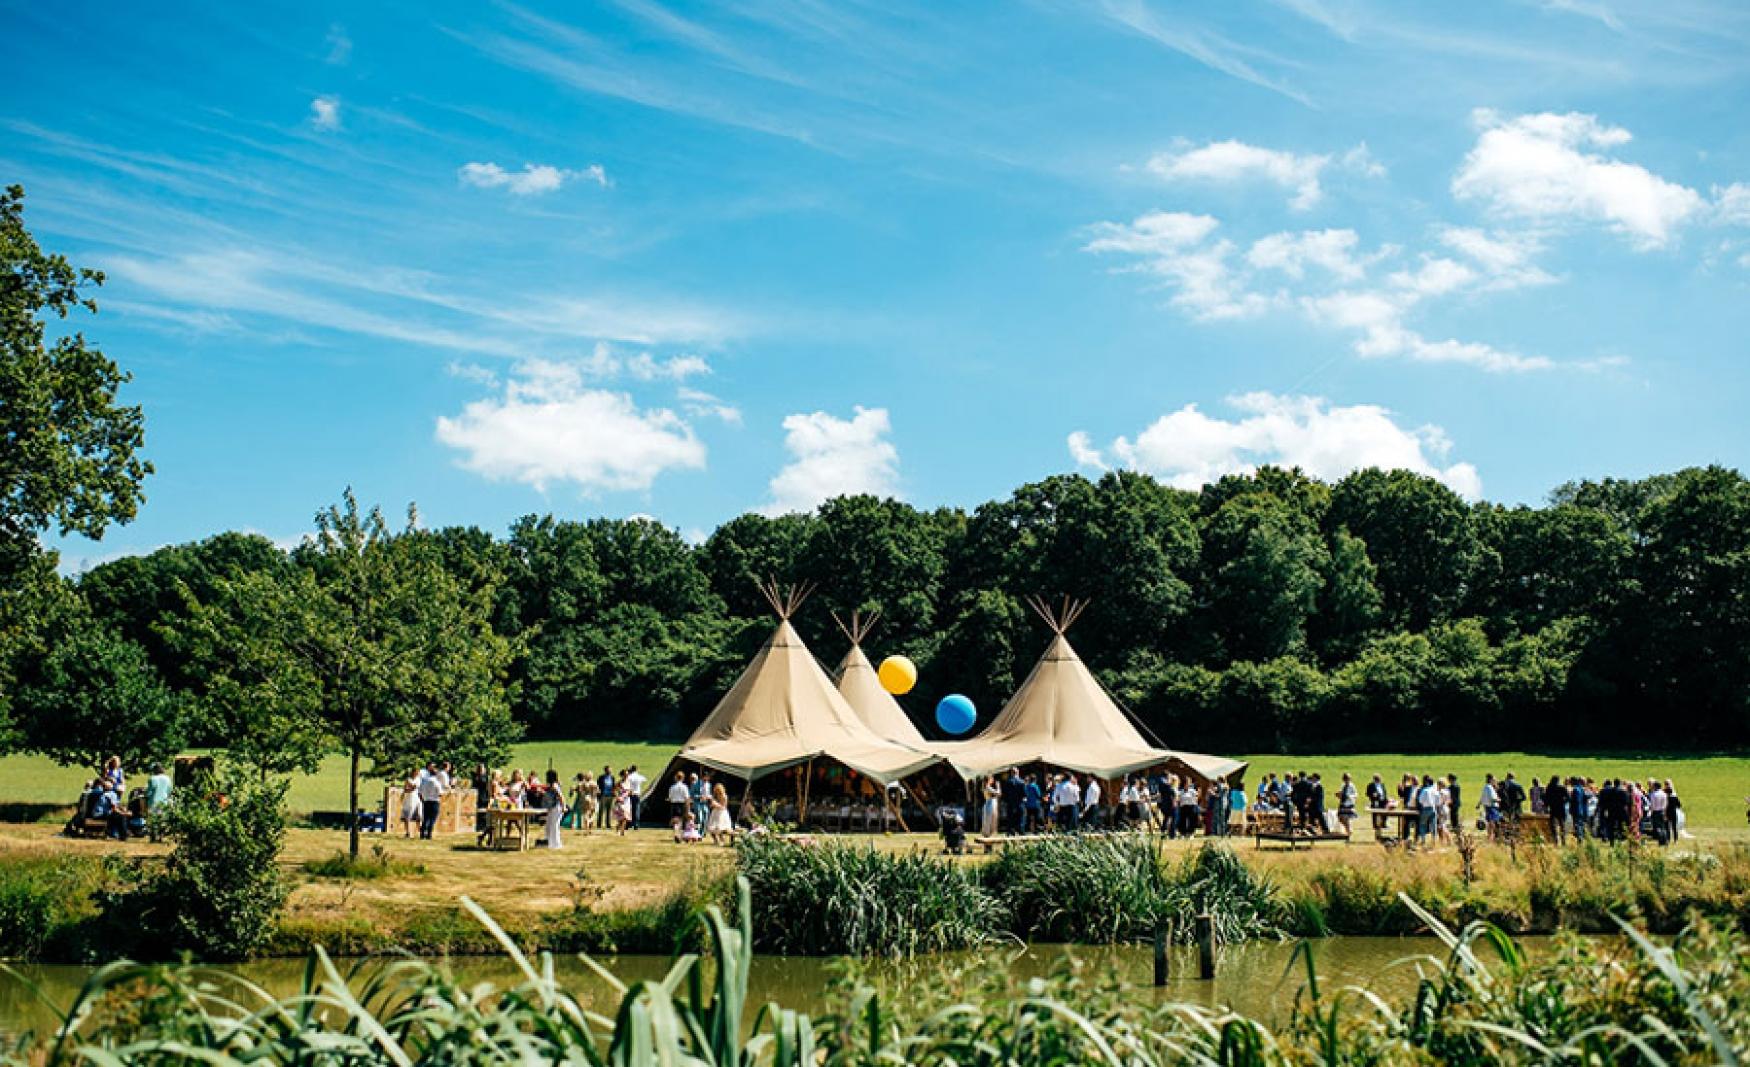 fiesta-fields-outdoor-wedding-events-company-tipi-surrey-sussex-maplehurst-farm-nuthurst-3